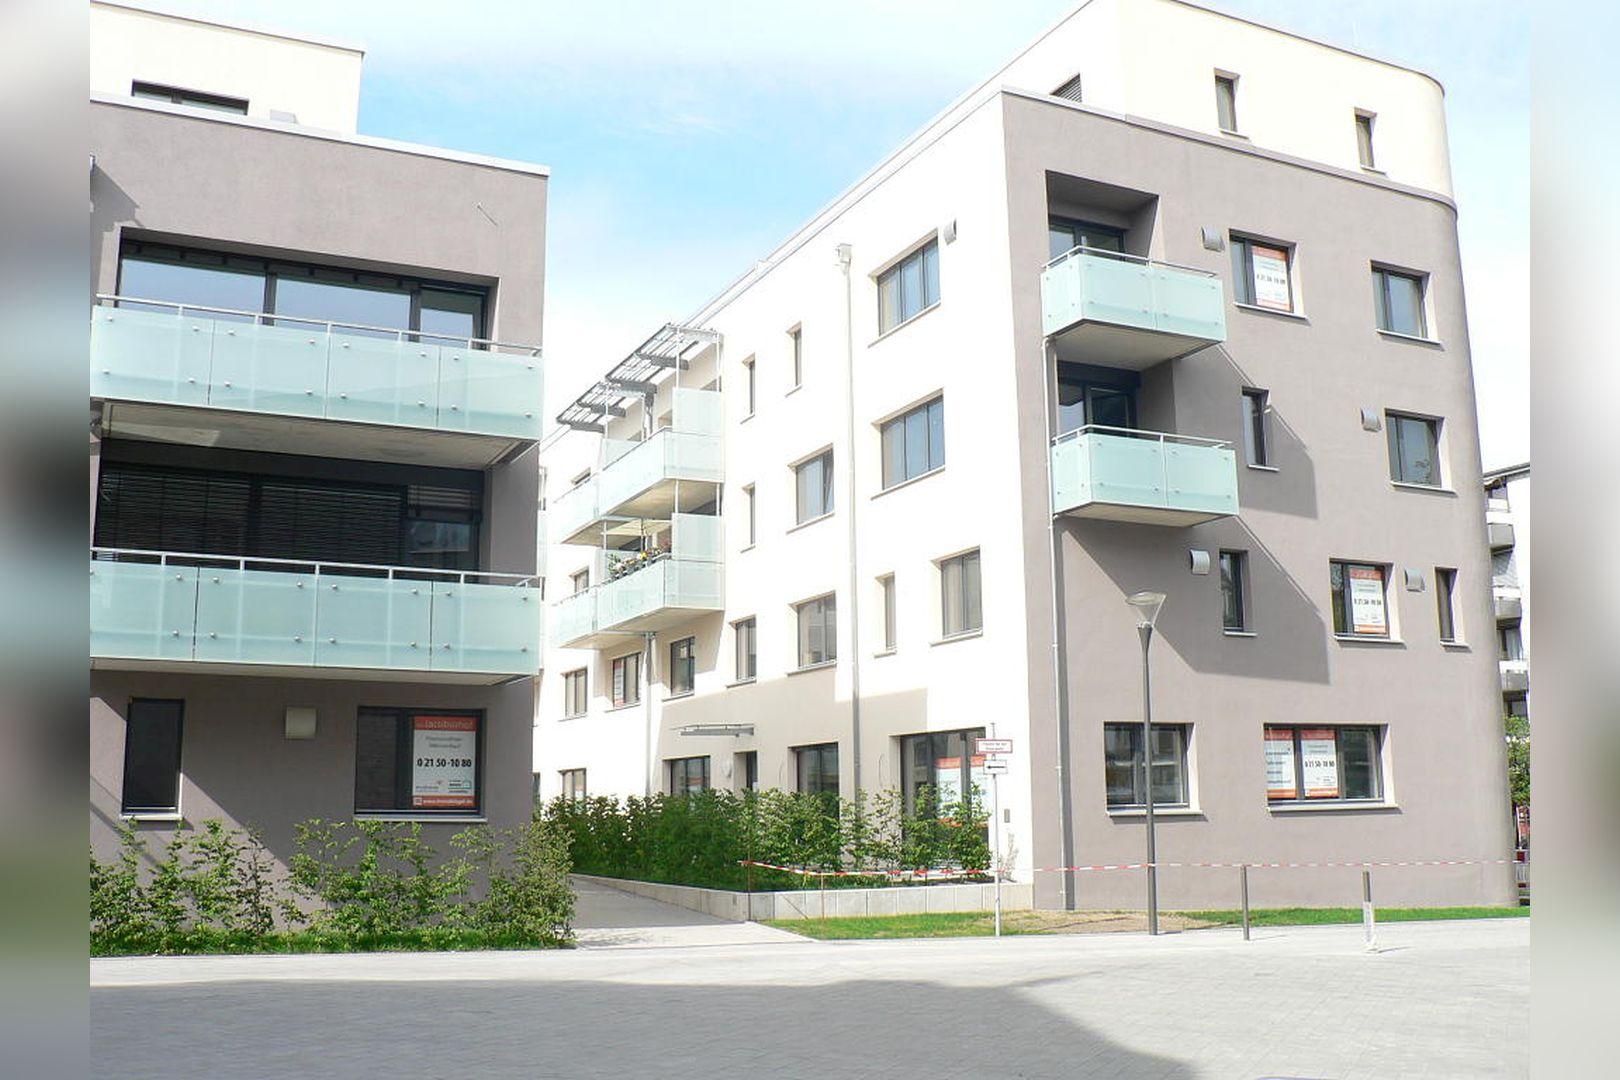 Immobilie Nr.0222 | Hochdahler Str. 3, 40724 Hilden